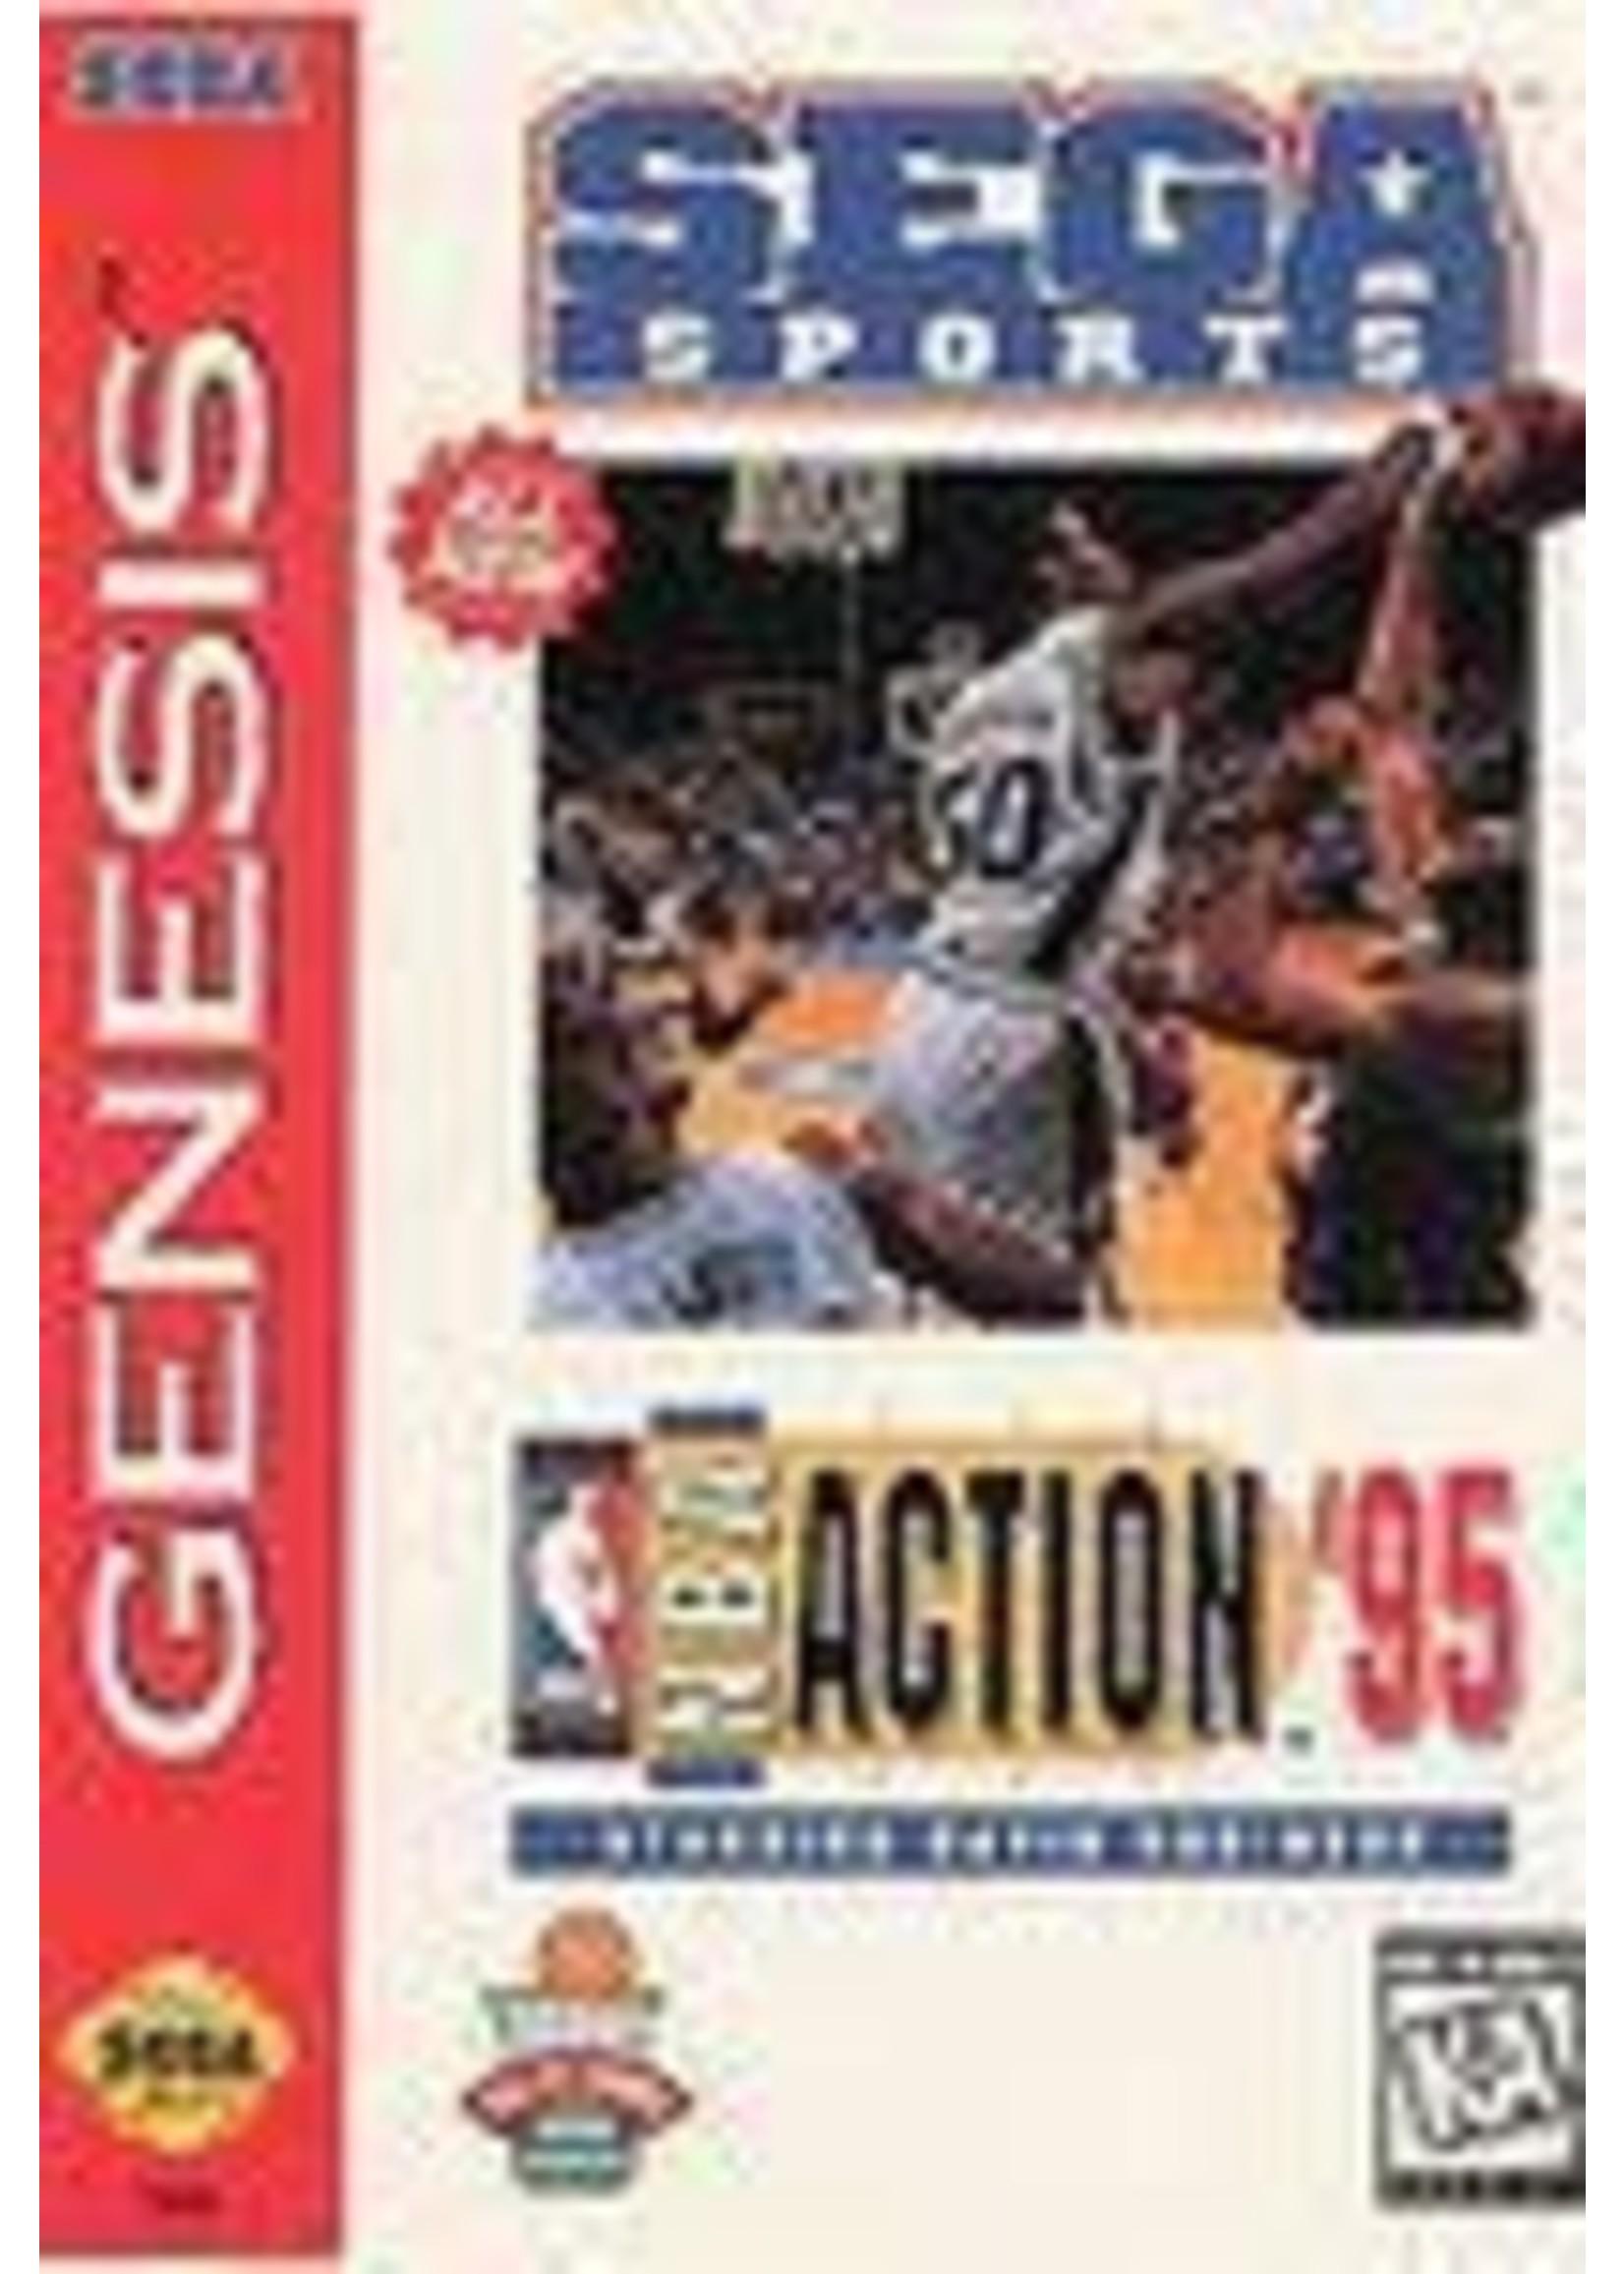 NBA Action '95 Starring David Robinson Sega Genesis